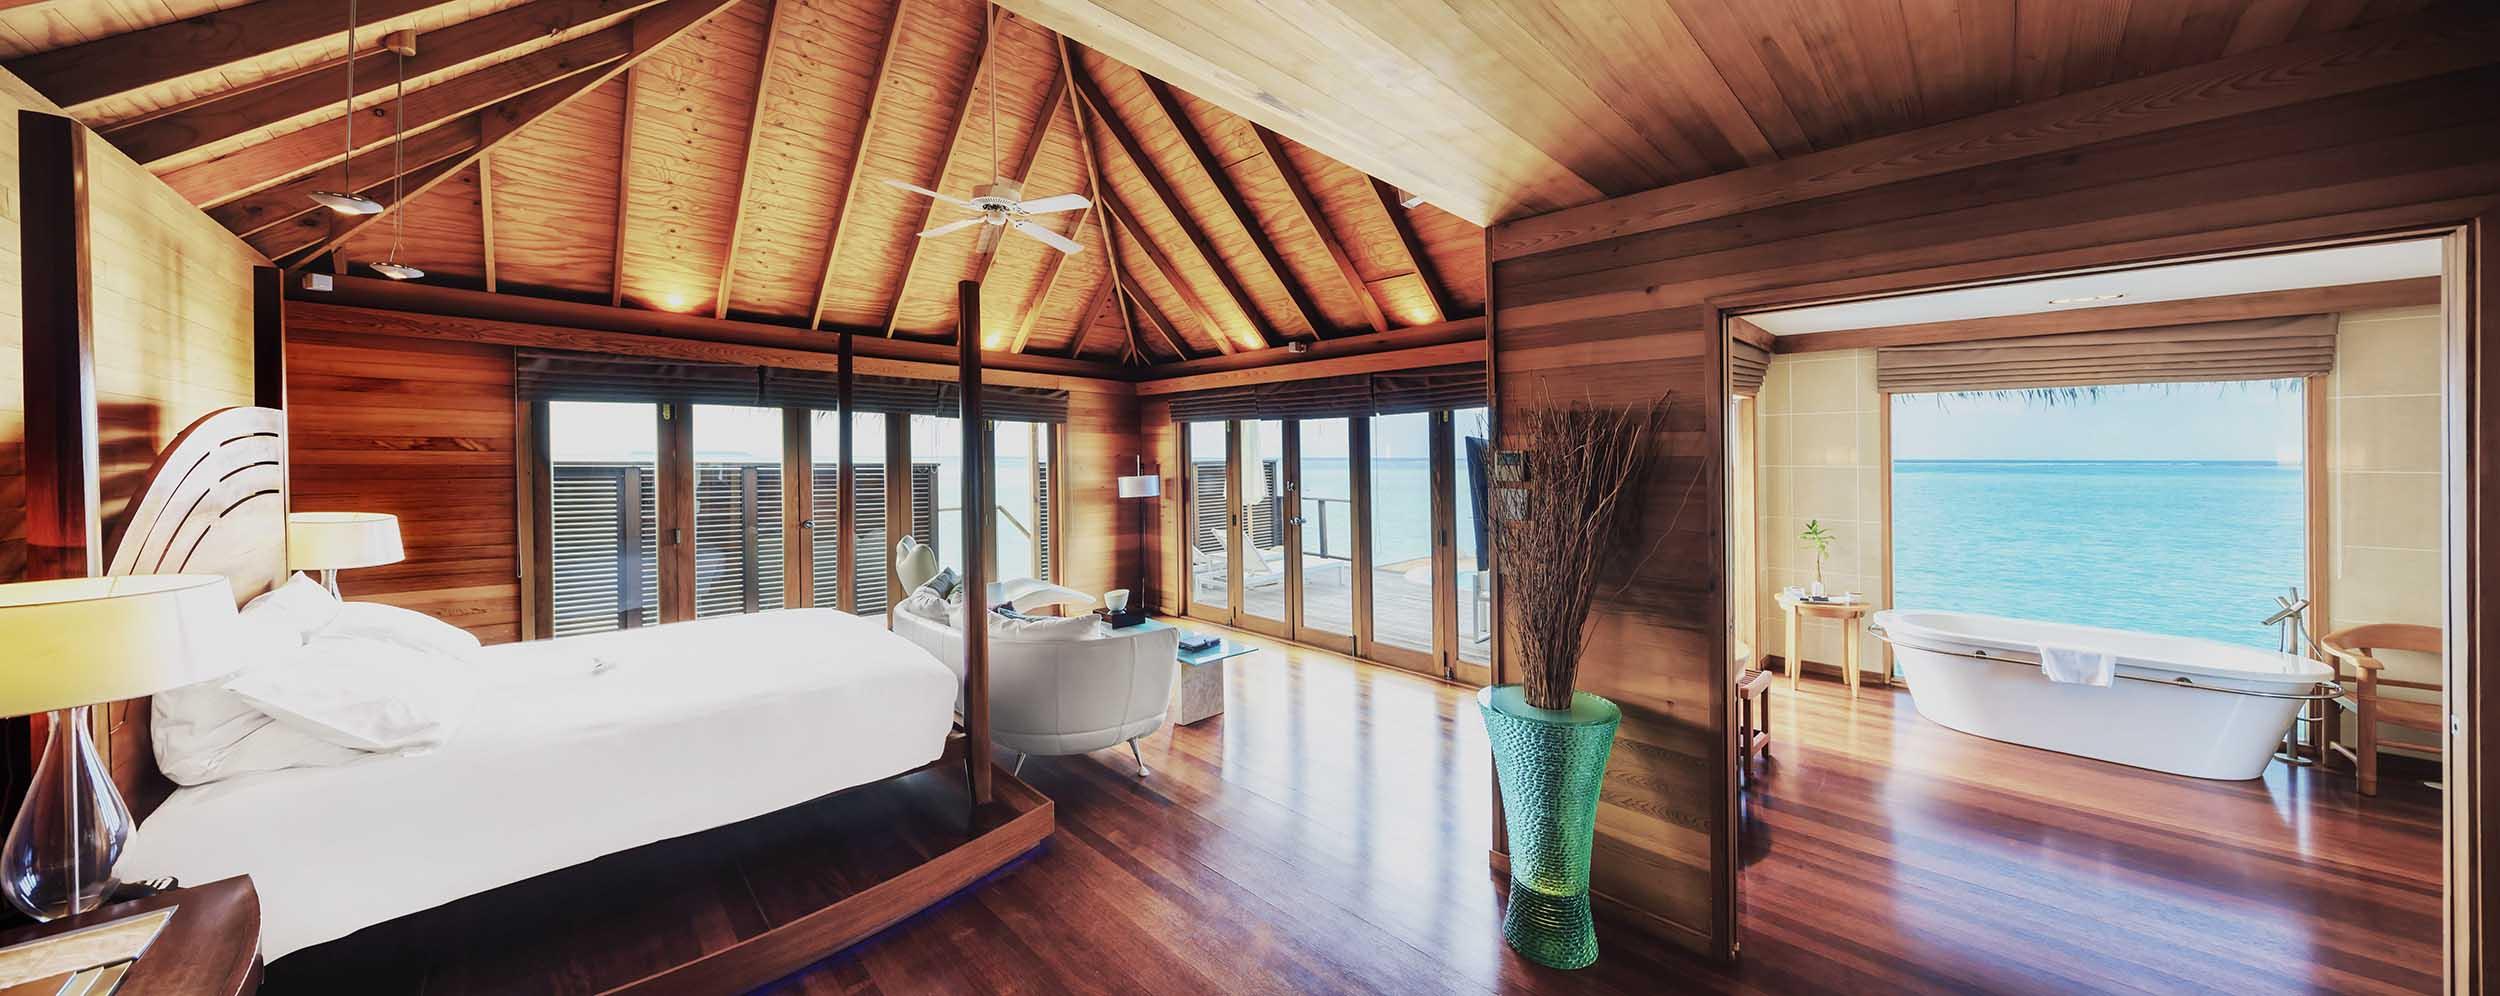 interior design photographer 36.jpg